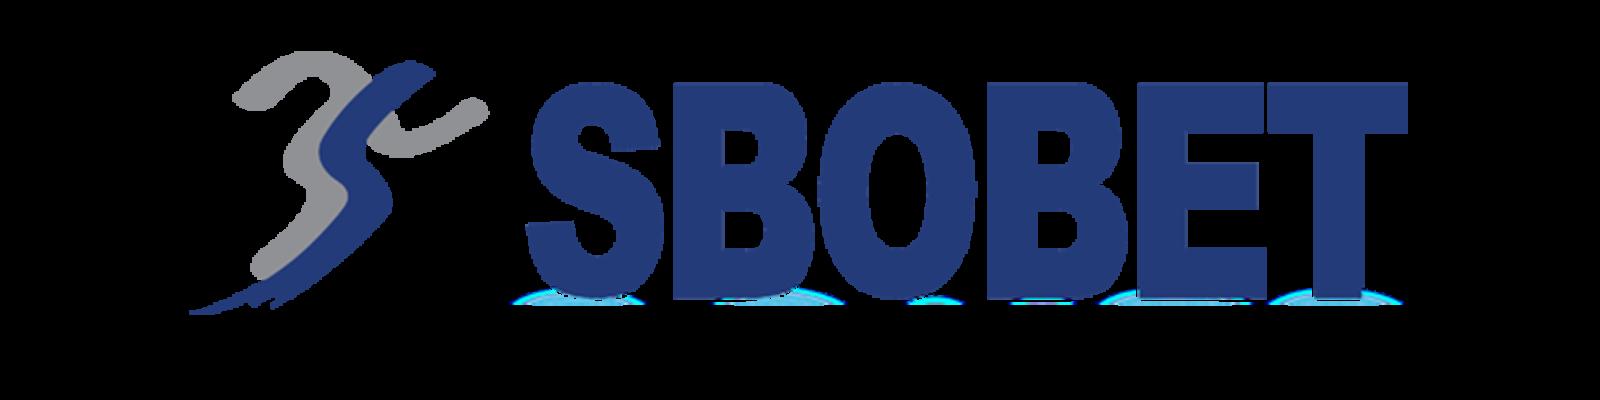 cropped-sbobet-logo-1600.png